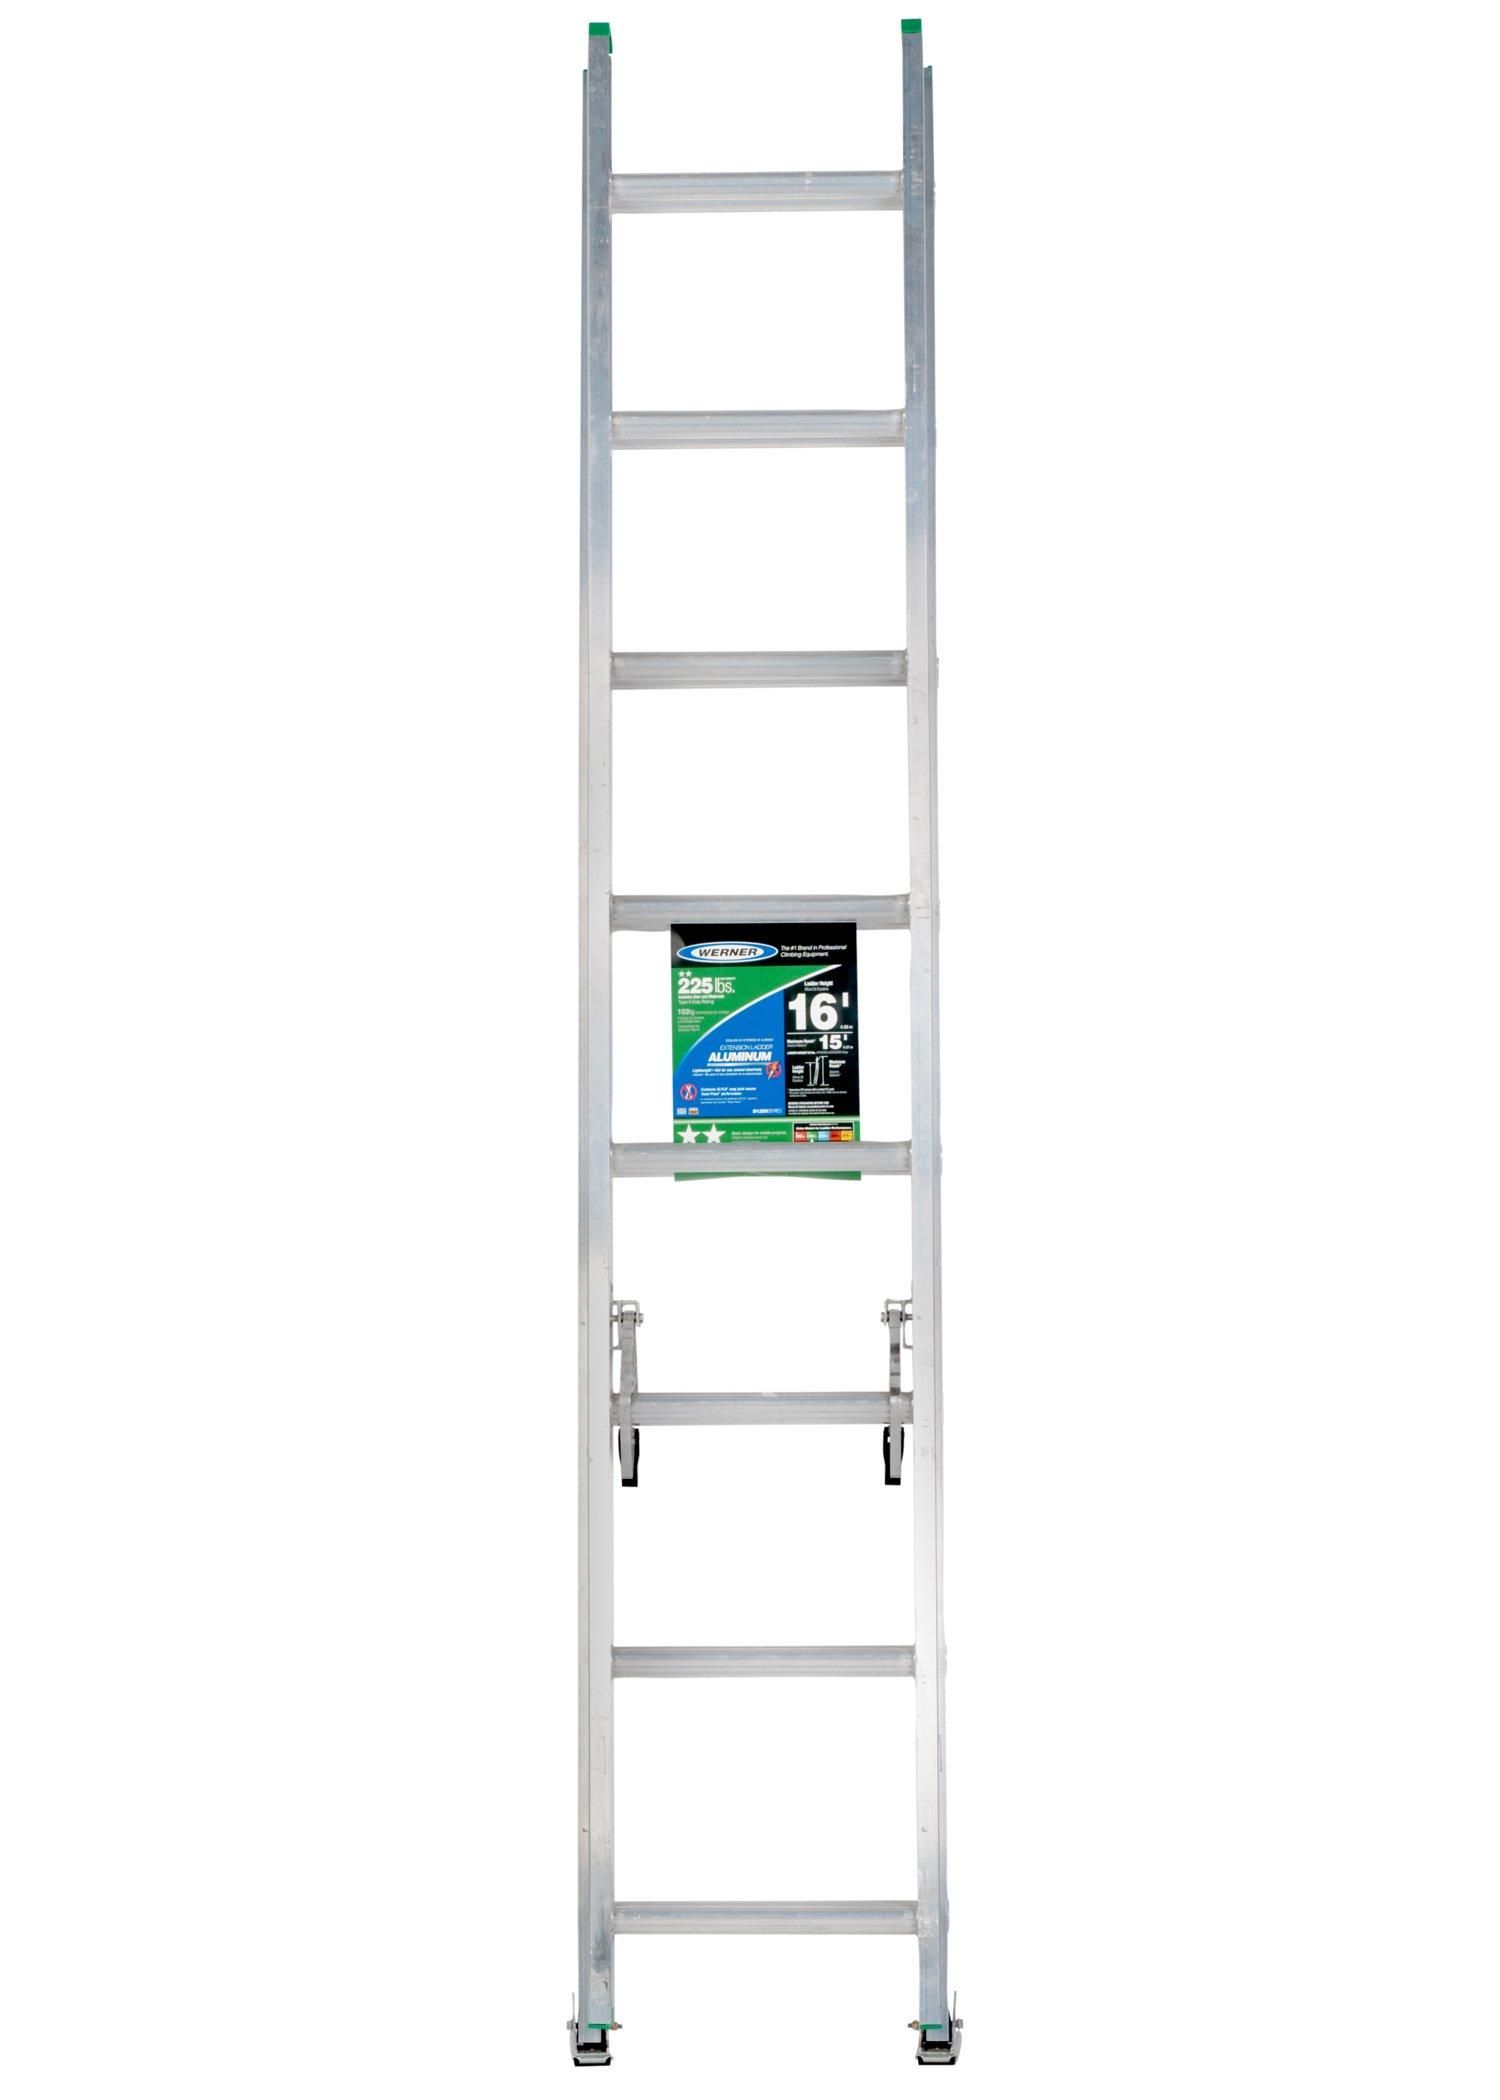 Werner D1216-2 225-Pound Duty Rating Aluminum Flat D-Rung Extension Ladder, 16-Foot